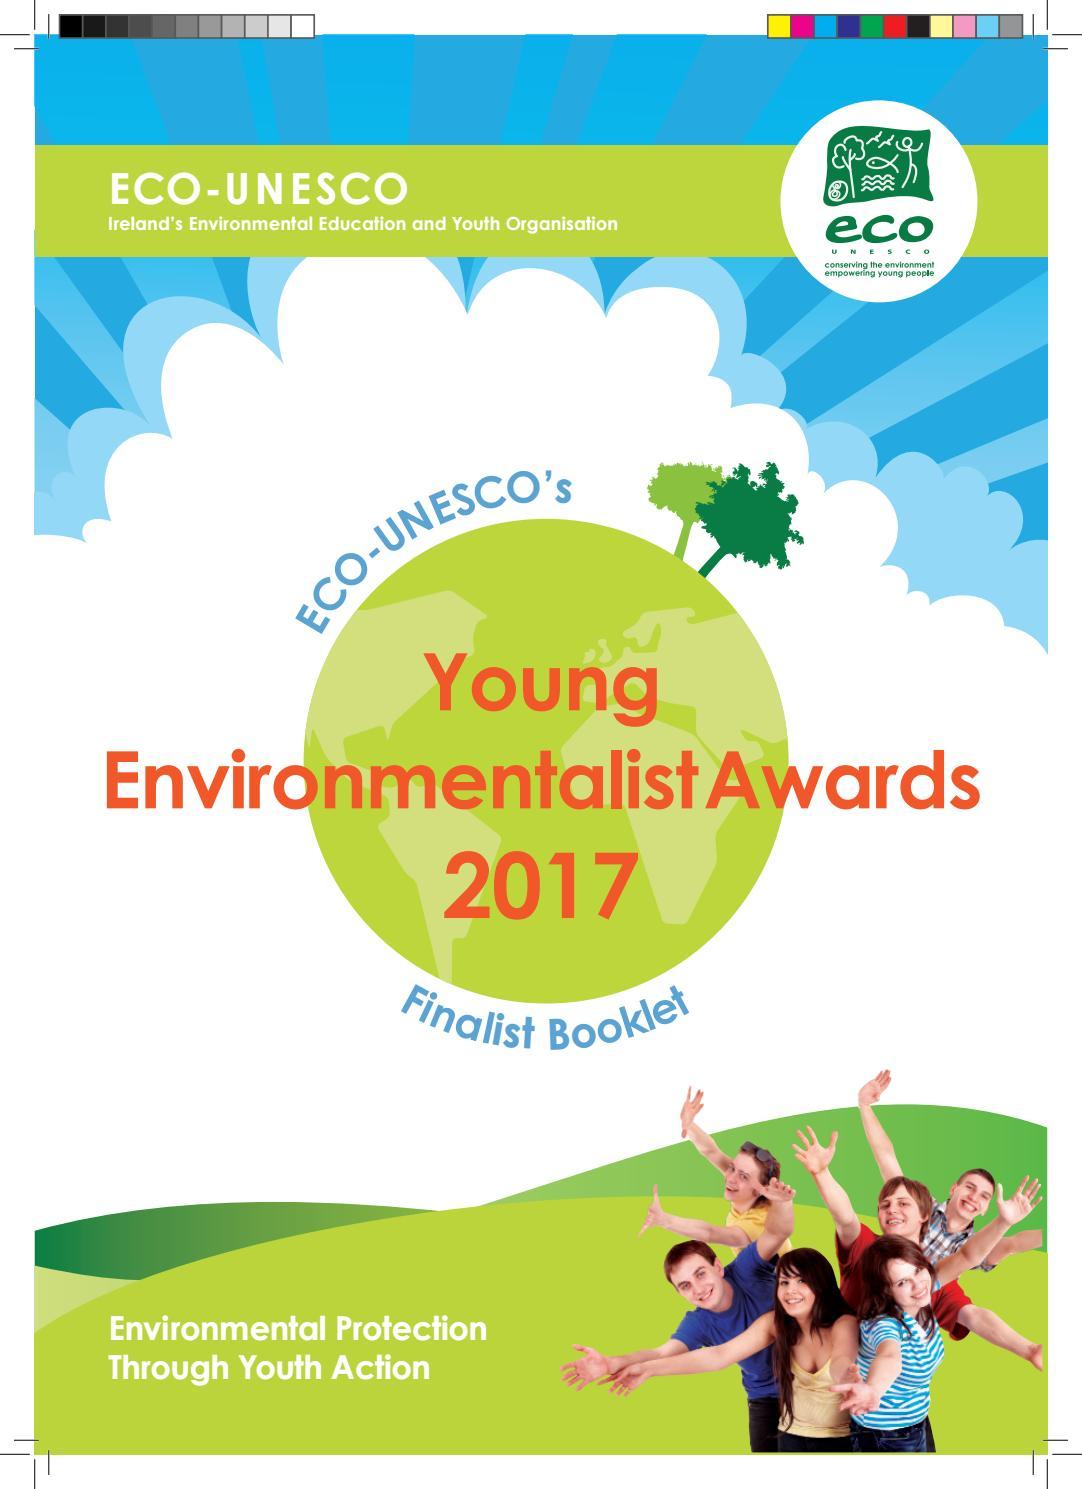 ECO-UNESCO's YEA 2017 Finalist Booklet by ECO-UNESCO - issuu